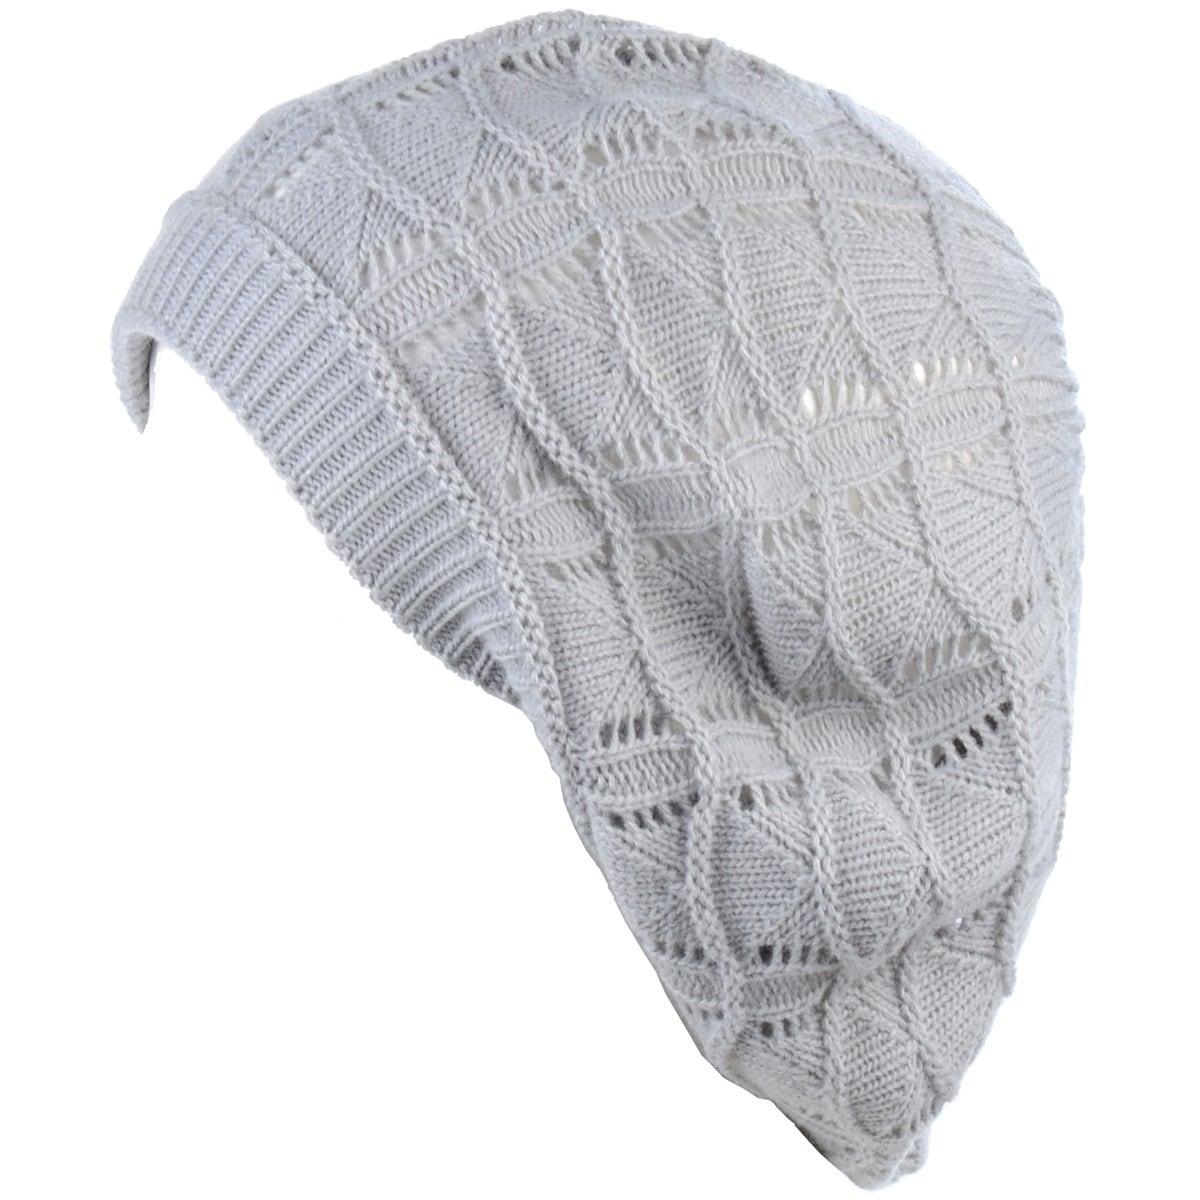 47aa4a351 BYOS Chic Soft Knit Airy Cutout Lightweight Slouchy Crochet Beret Beanie Hat